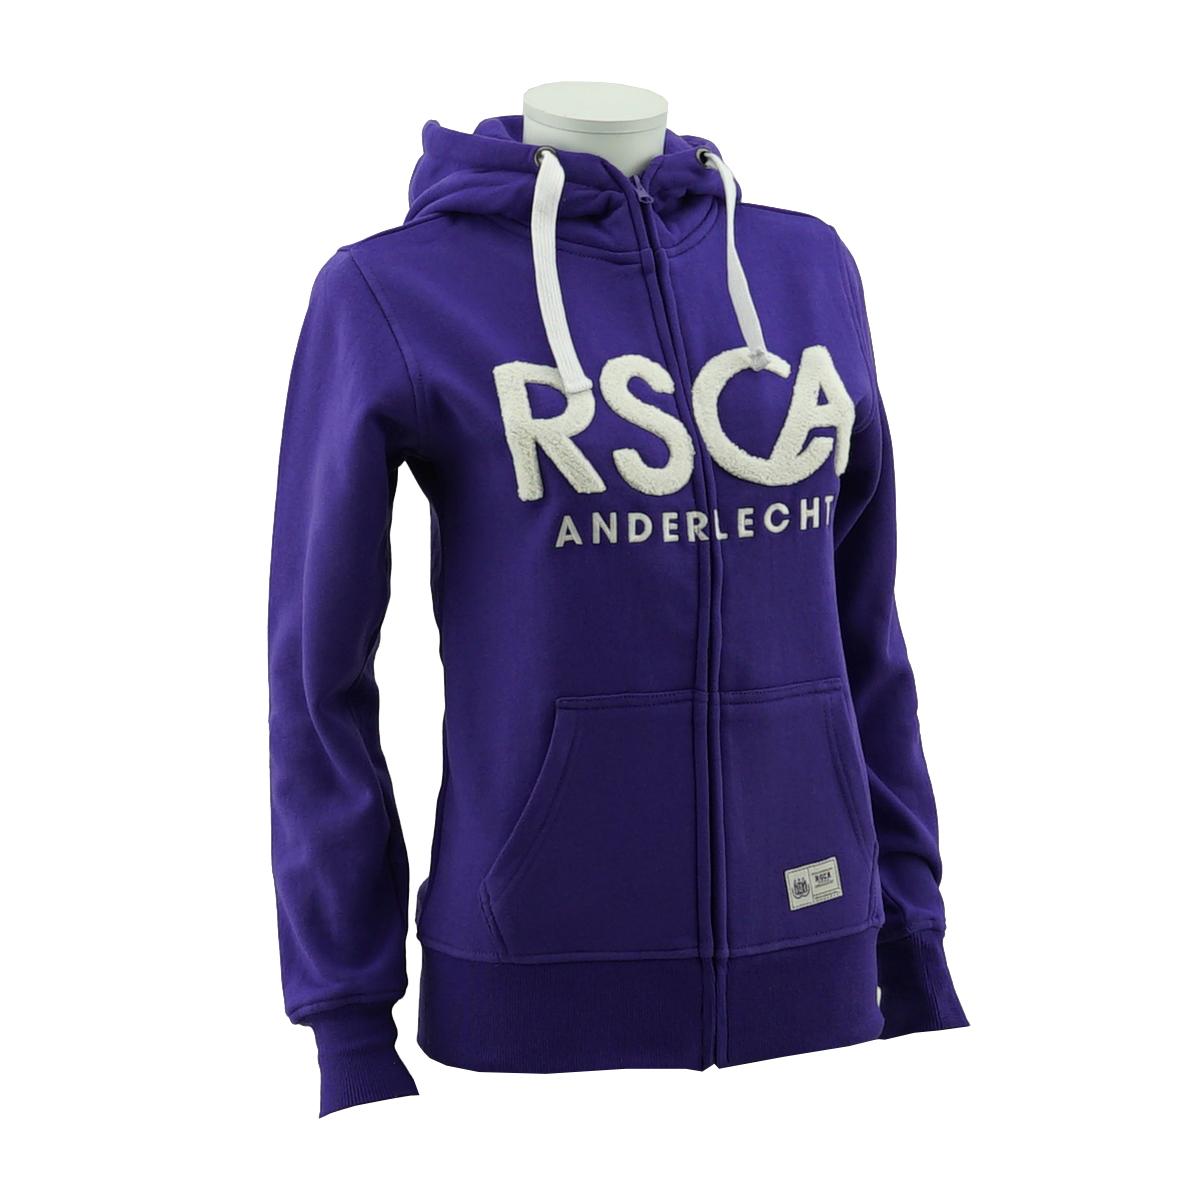 RSCA Sweatvest Met Kap Dames RSCA Anderlecht